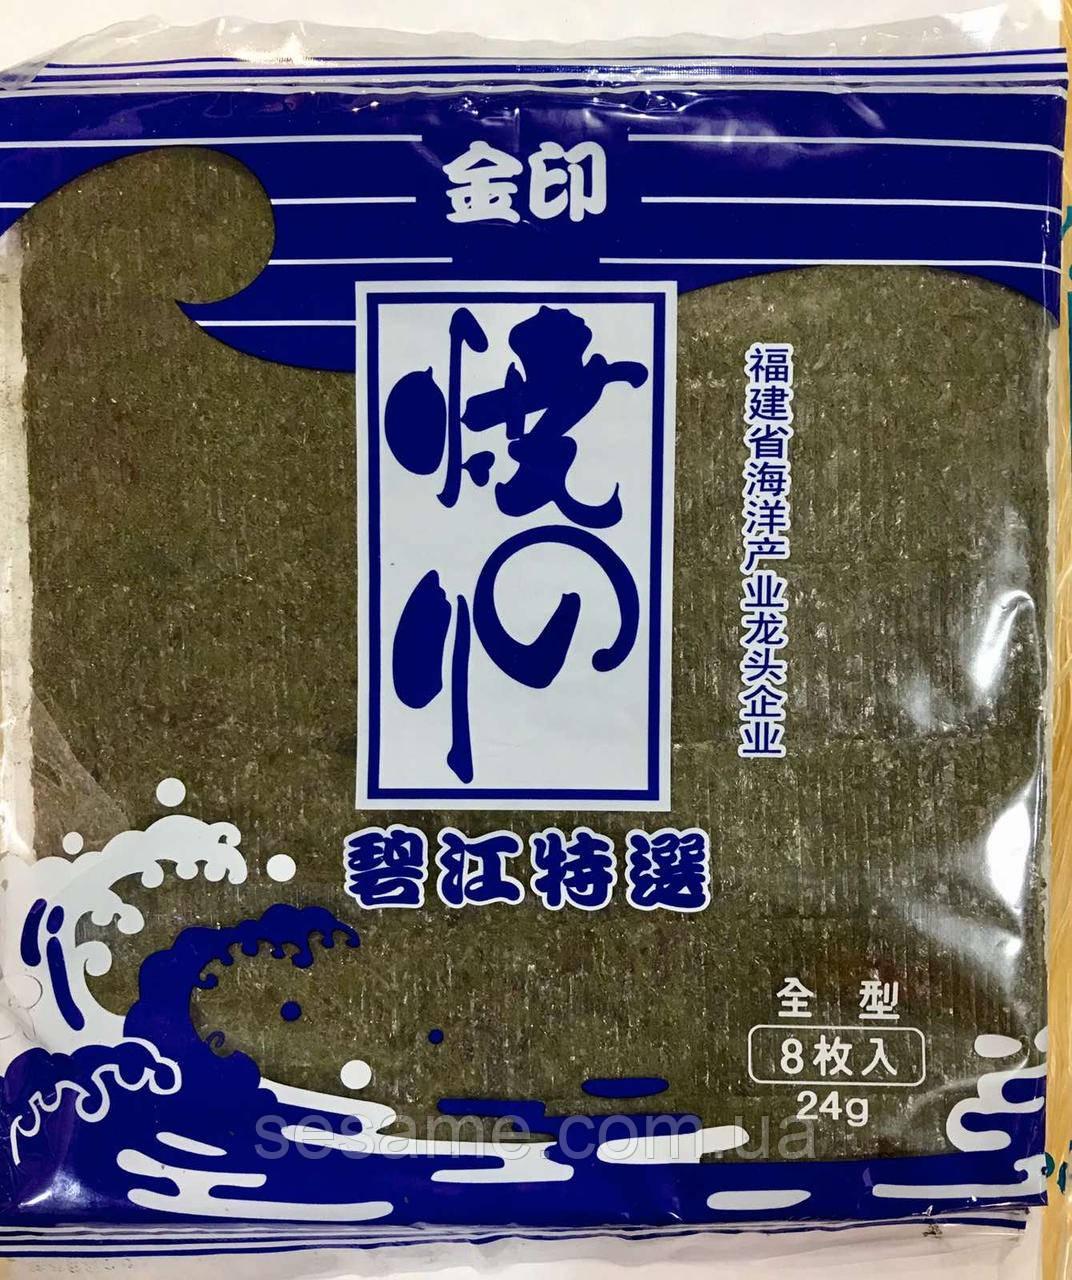 Водоросли Нори Nori 10 листов 24г (Китай)